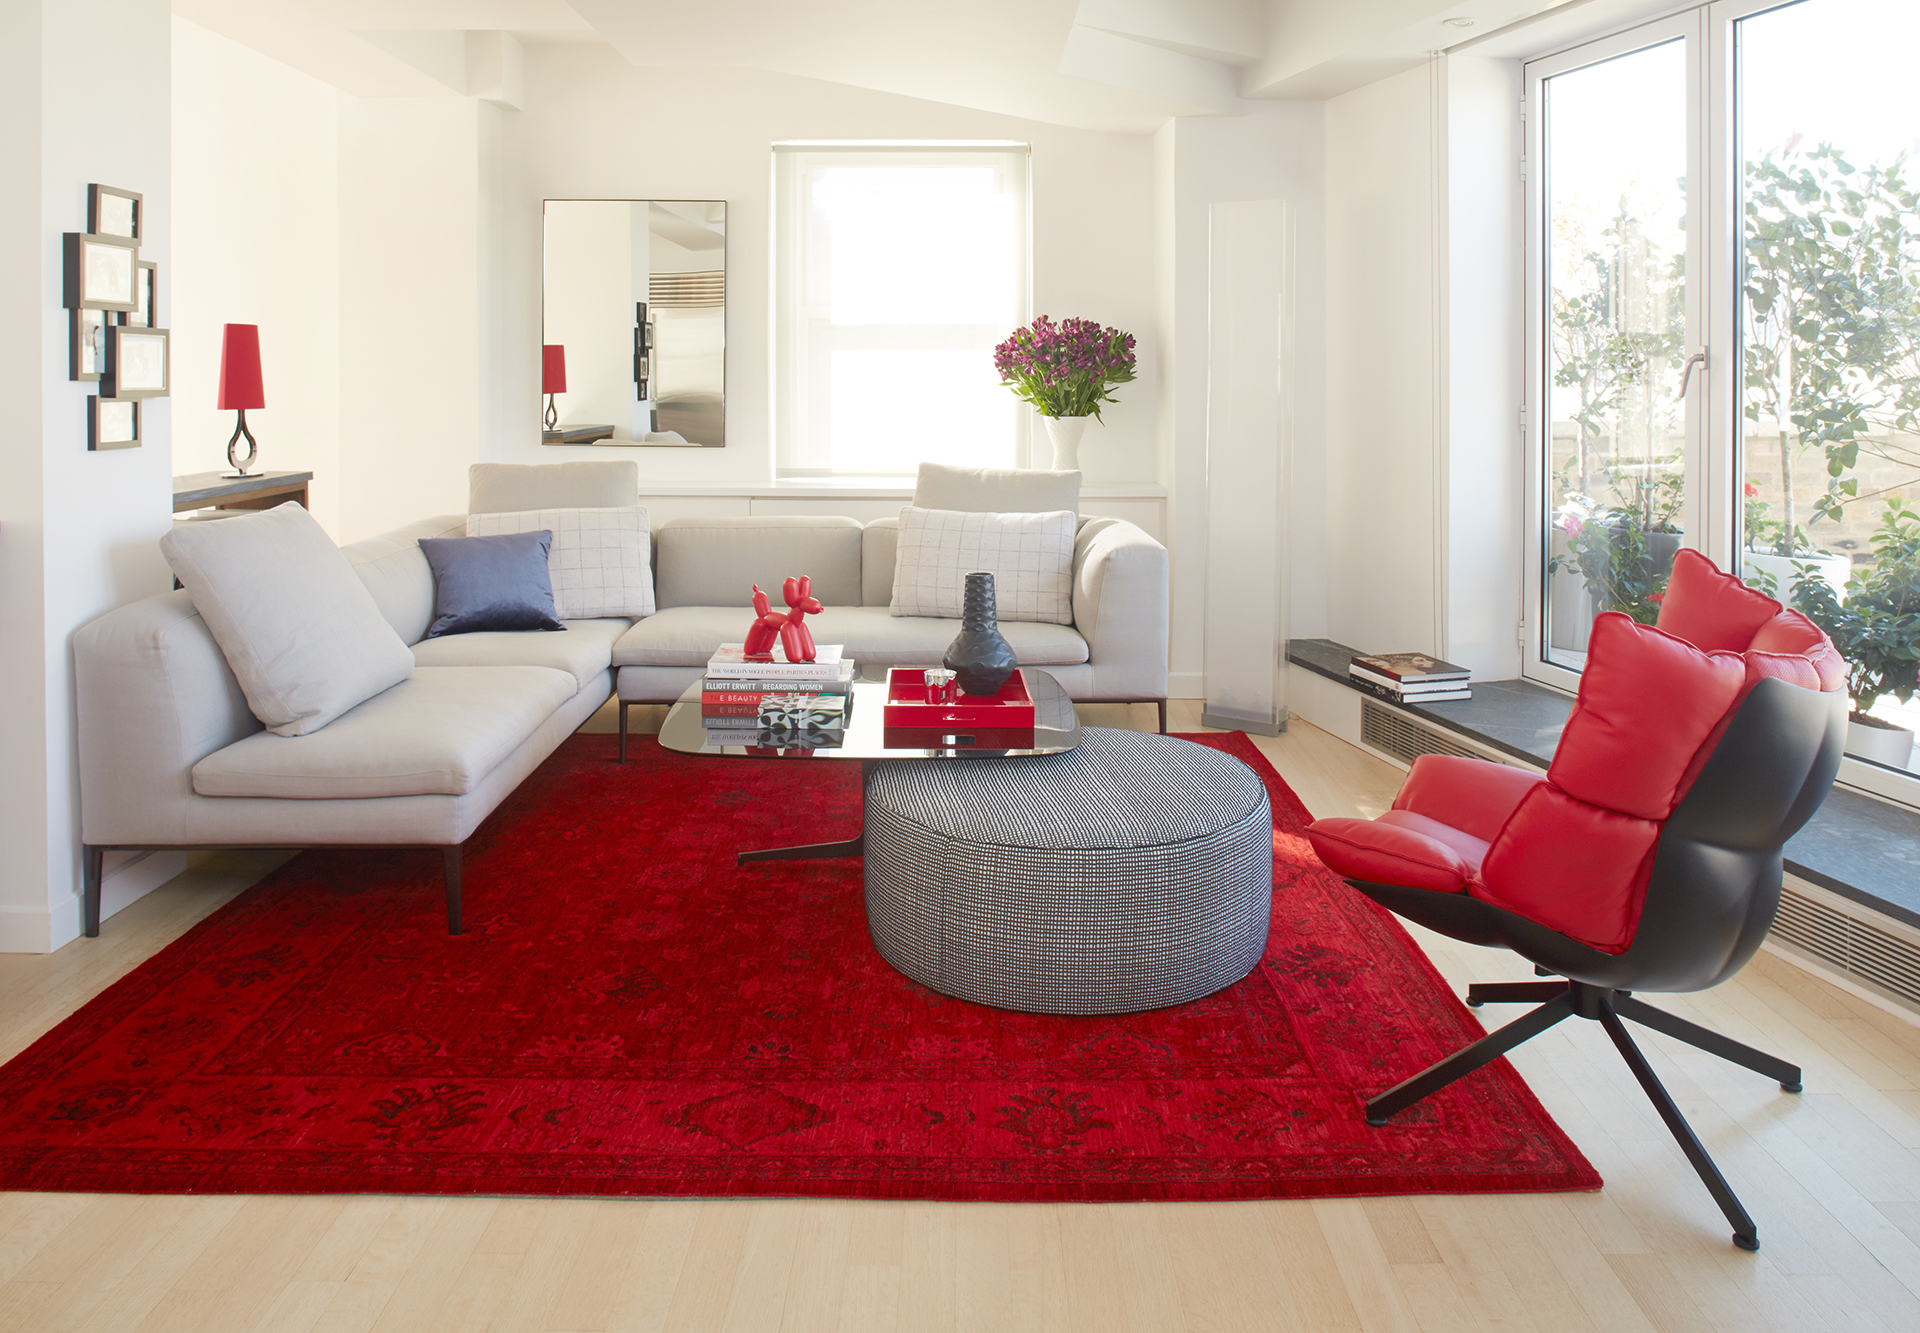 Contemporary Garden Home • Upper West Side New York